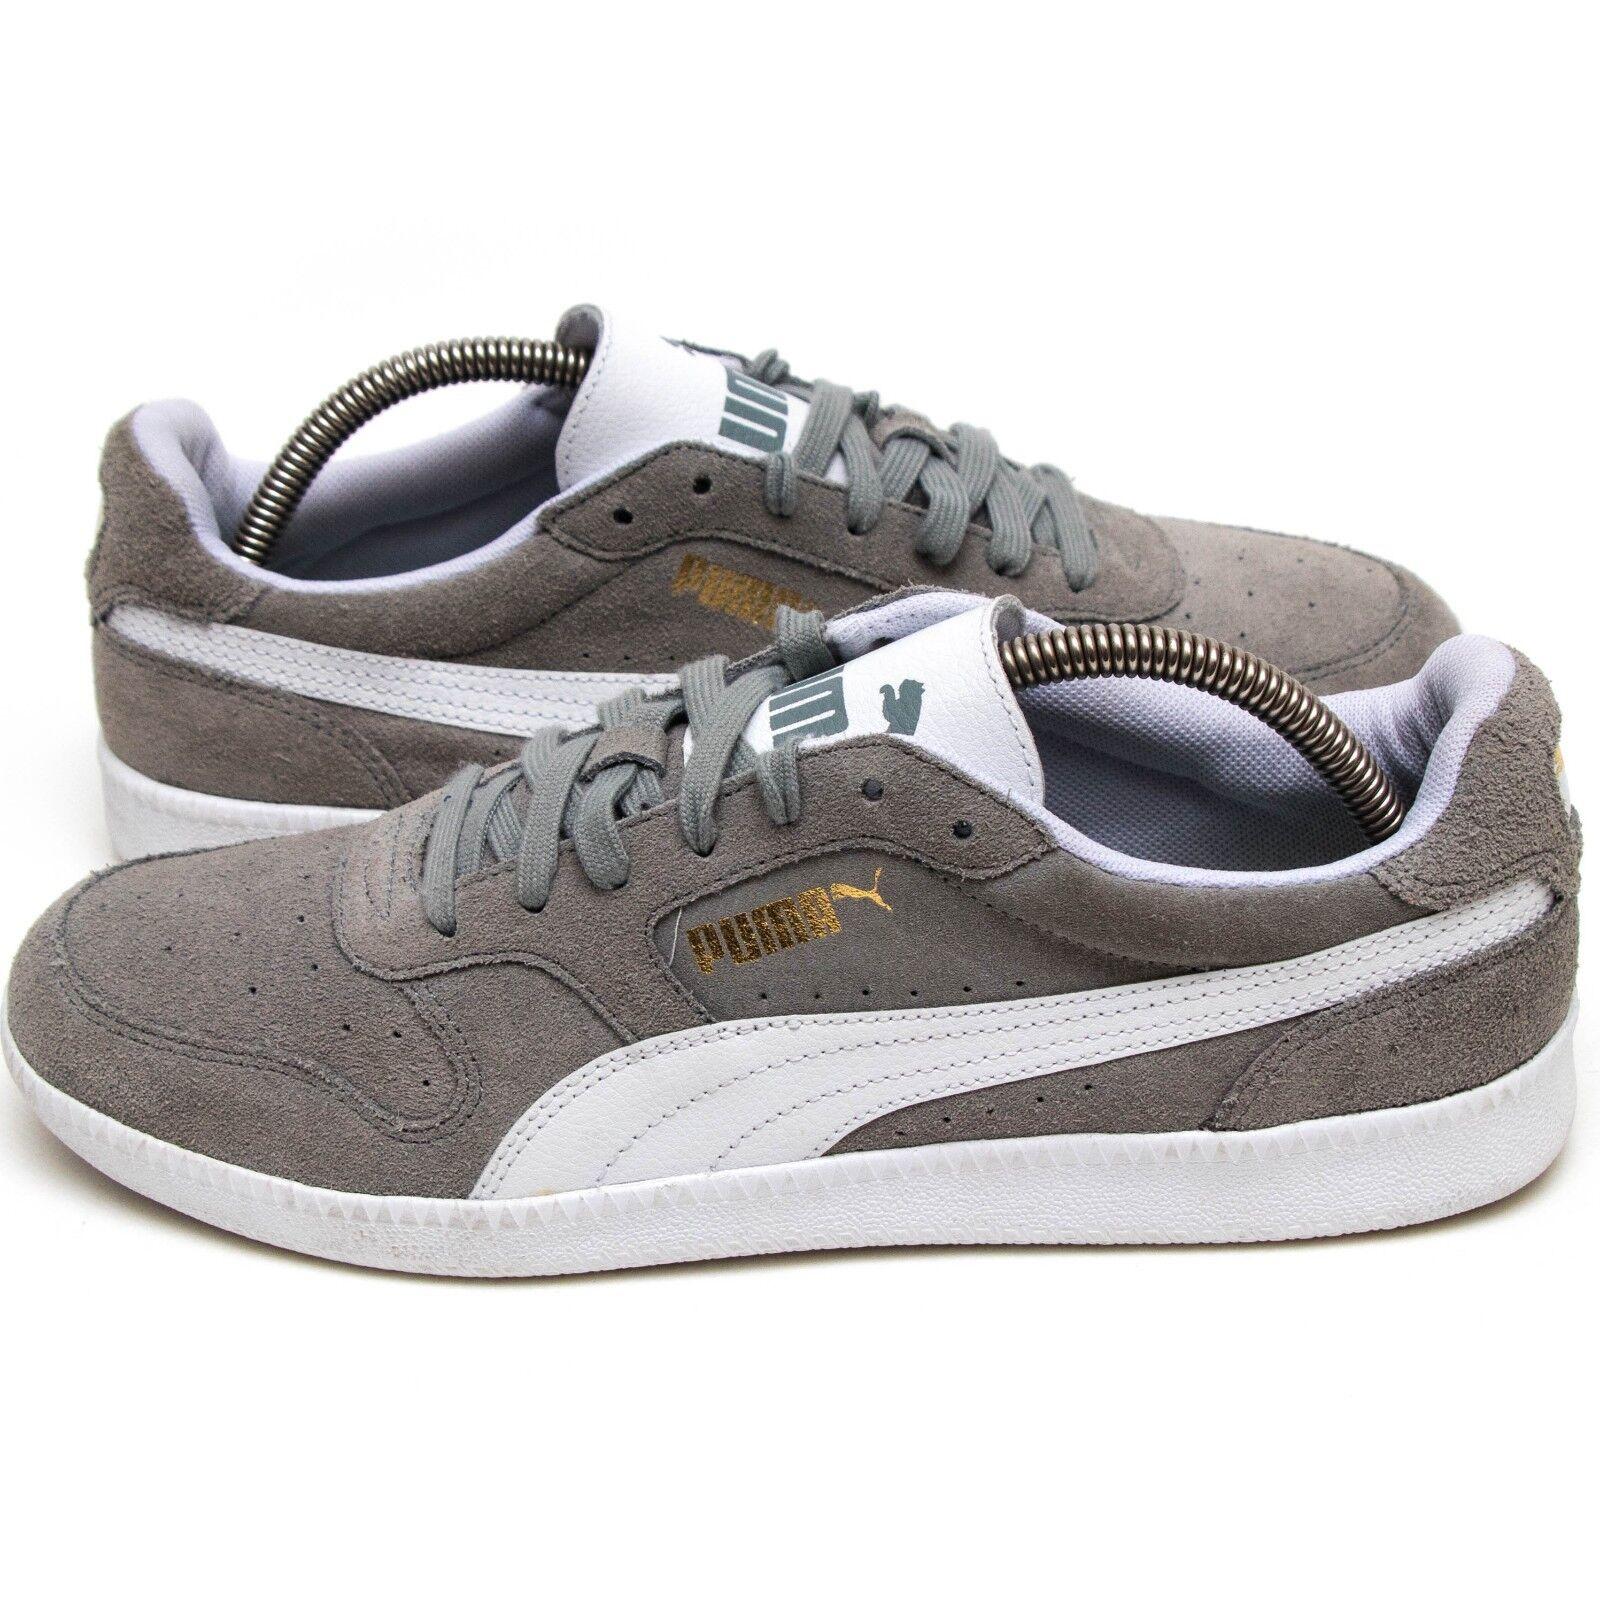 491) UK 8 EU 42 Größe grau grau Schuhe Turnschuhe Retro